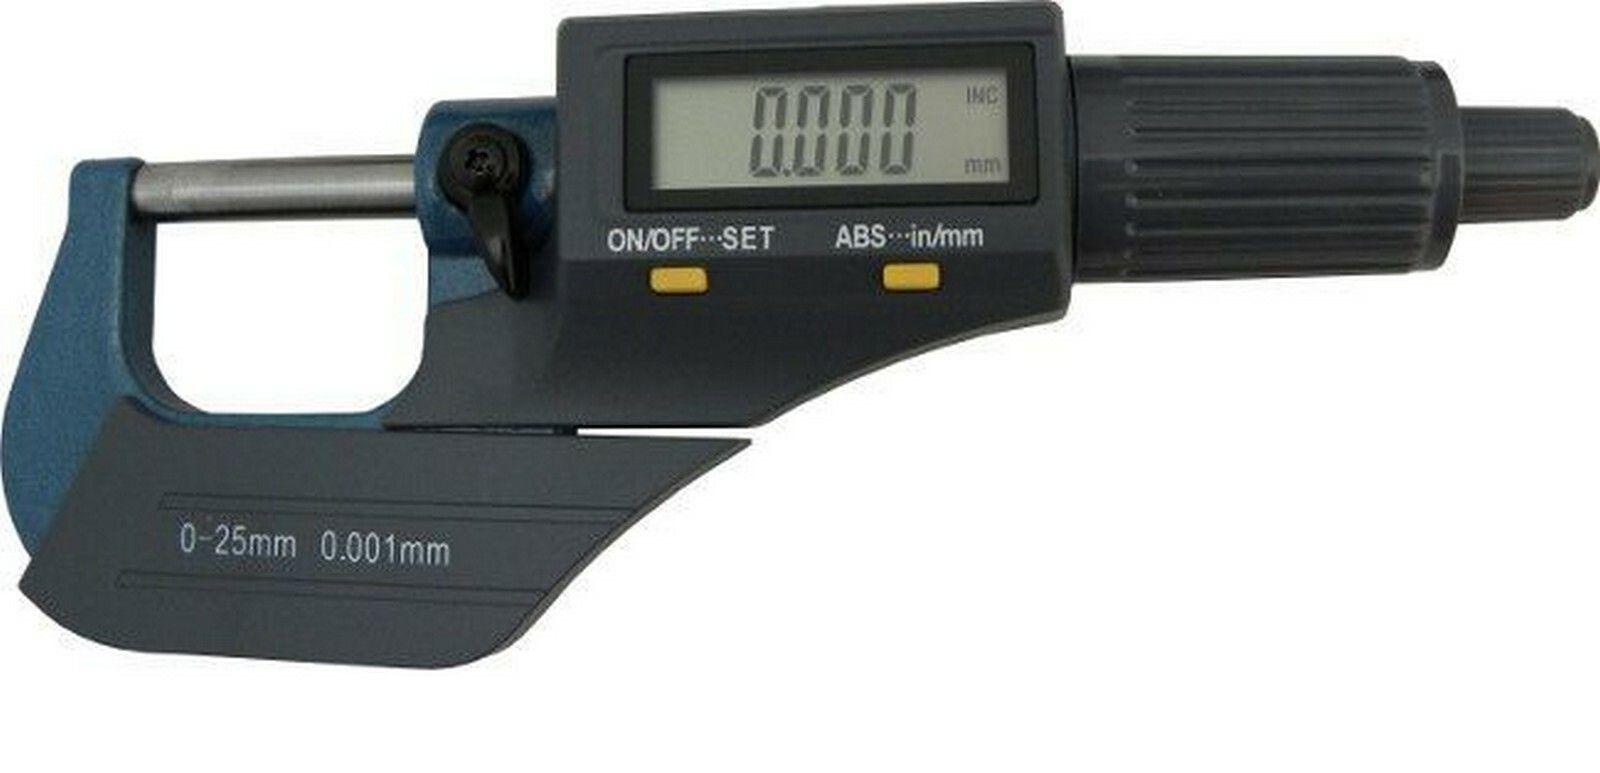 Mikrometr digitální, 0-25mm, GEKO